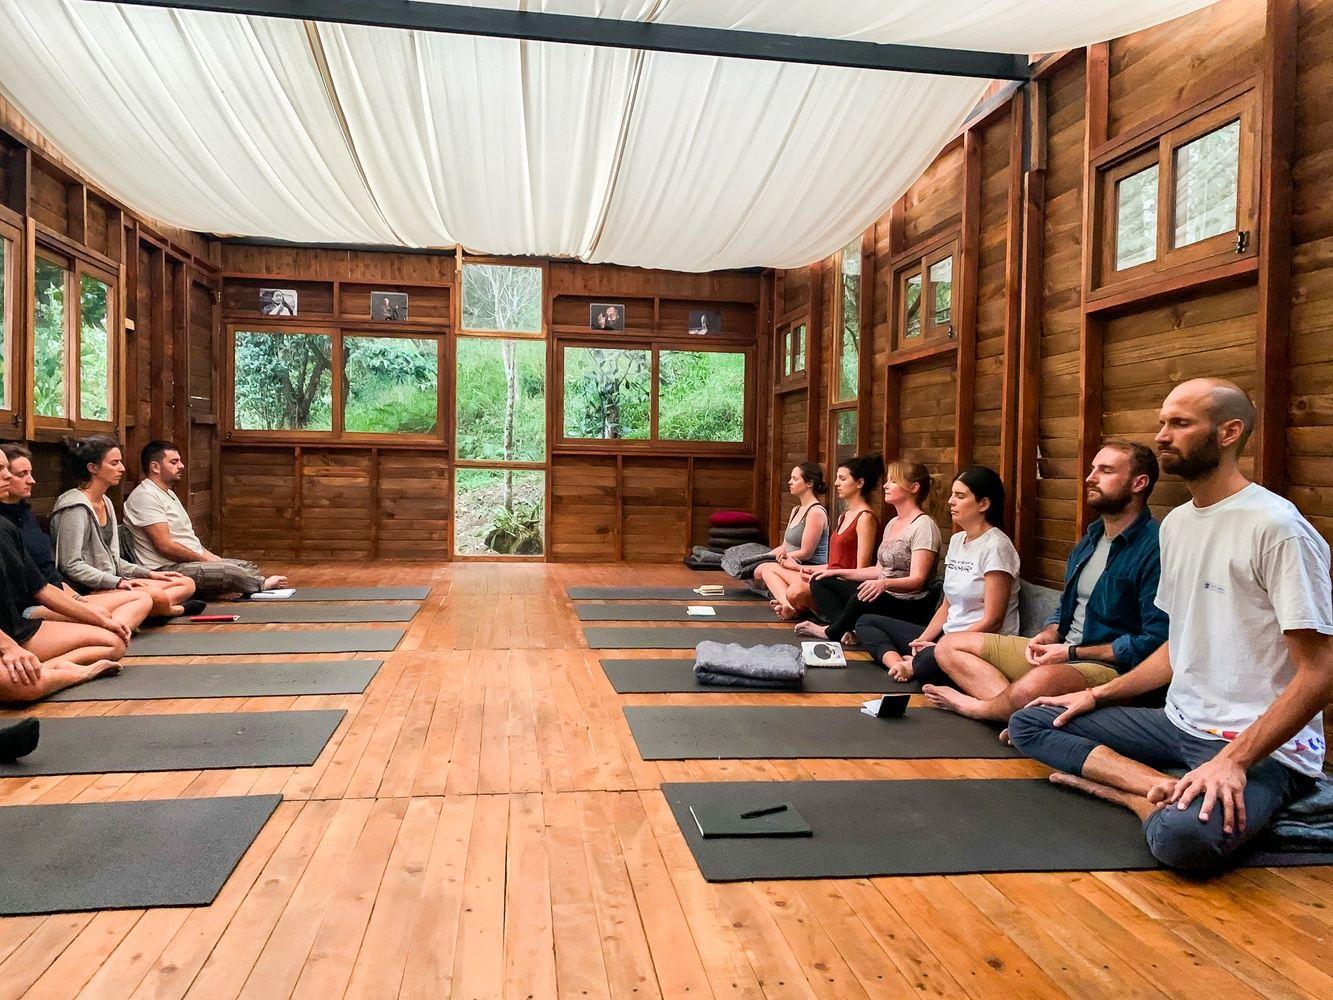 One Week Semi-Silent Meditation & Yoga Nature Retreat